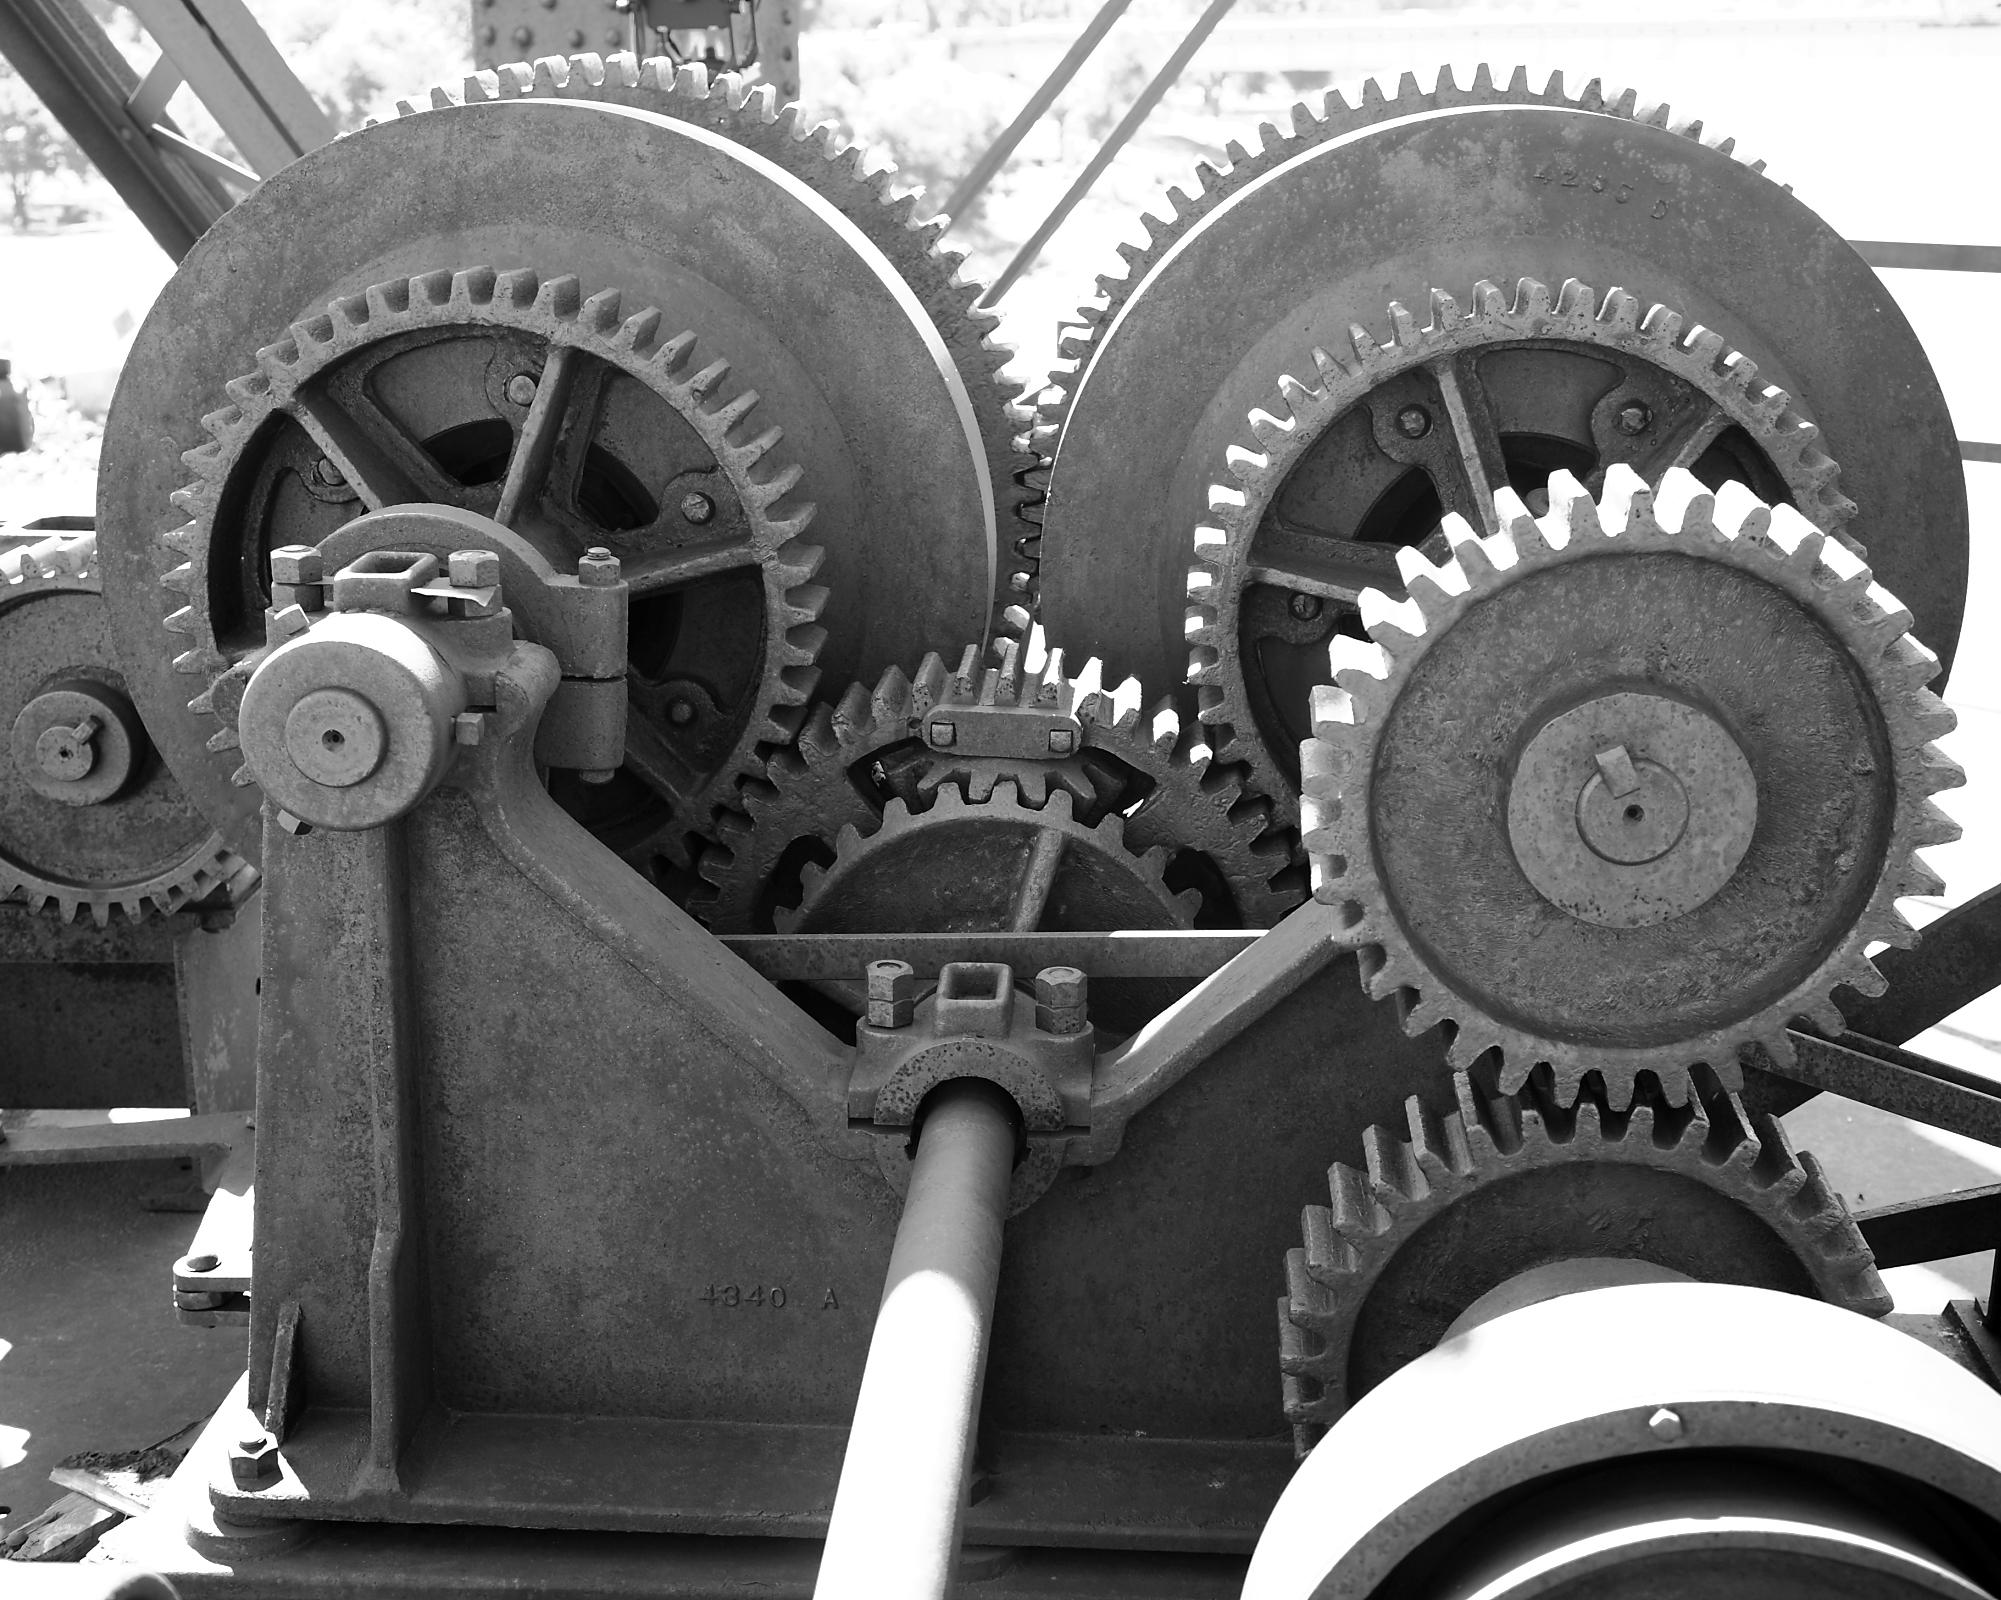 Pierre C&NW Bridge - Upper Drive Gears (Please credit Daniel R. Pratt and the Historic American Engineering Record)